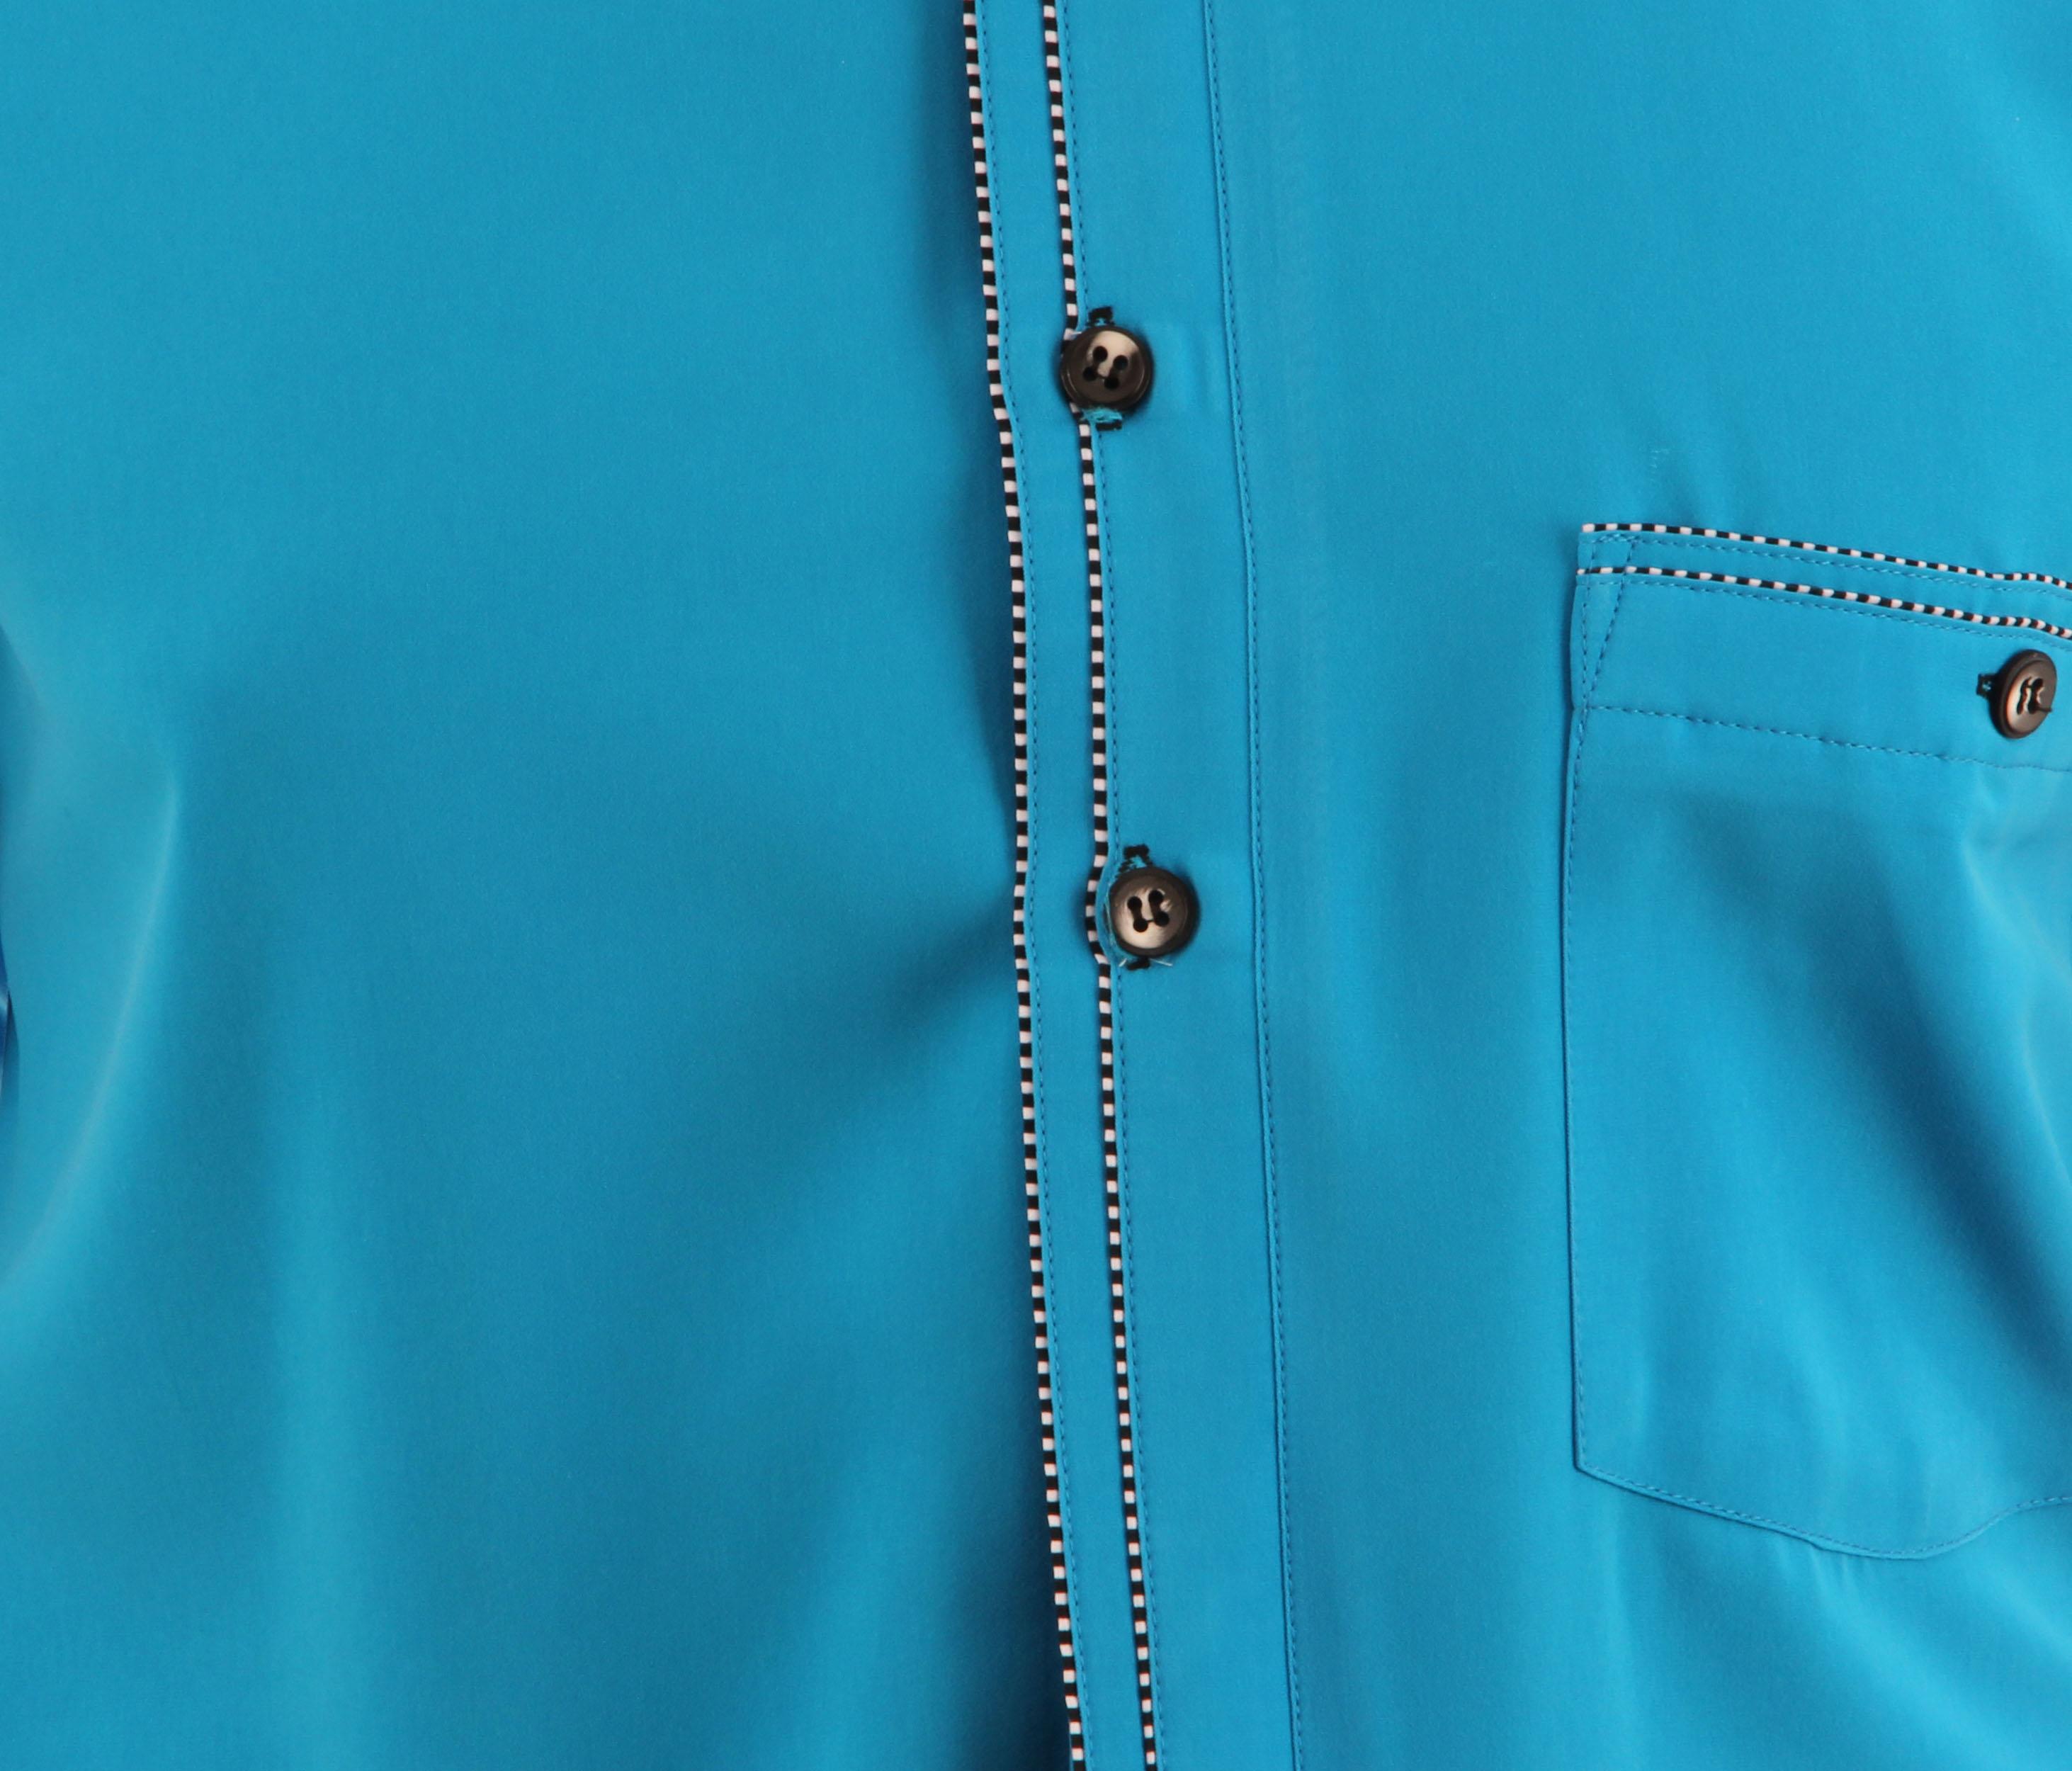 h k mandel kreative mode f r m nner designer hemd in cyan farbe besonderes hemd. Black Bedroom Furniture Sets. Home Design Ideas